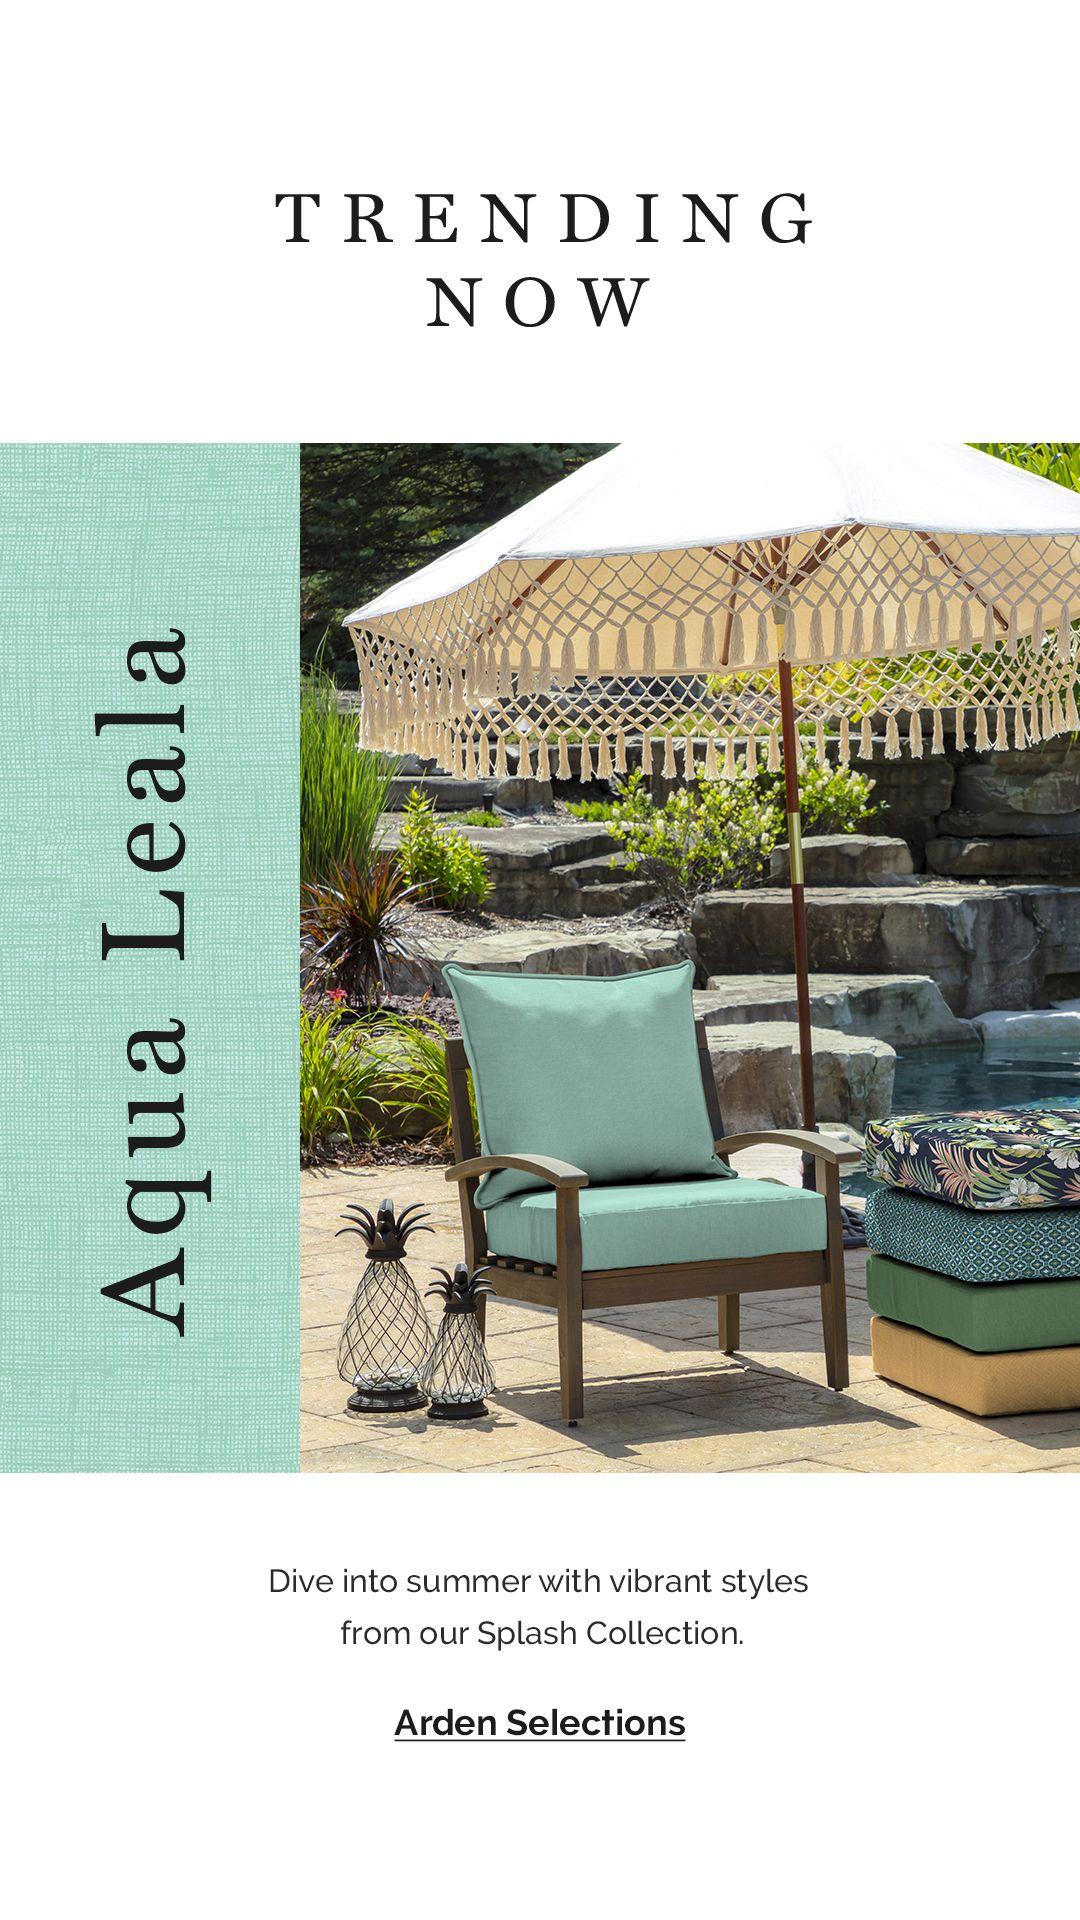 Bold Patio Ideas In 2020 Outdoor Deep Seat Cushions Patio Chair Cushions Backyard Renovations